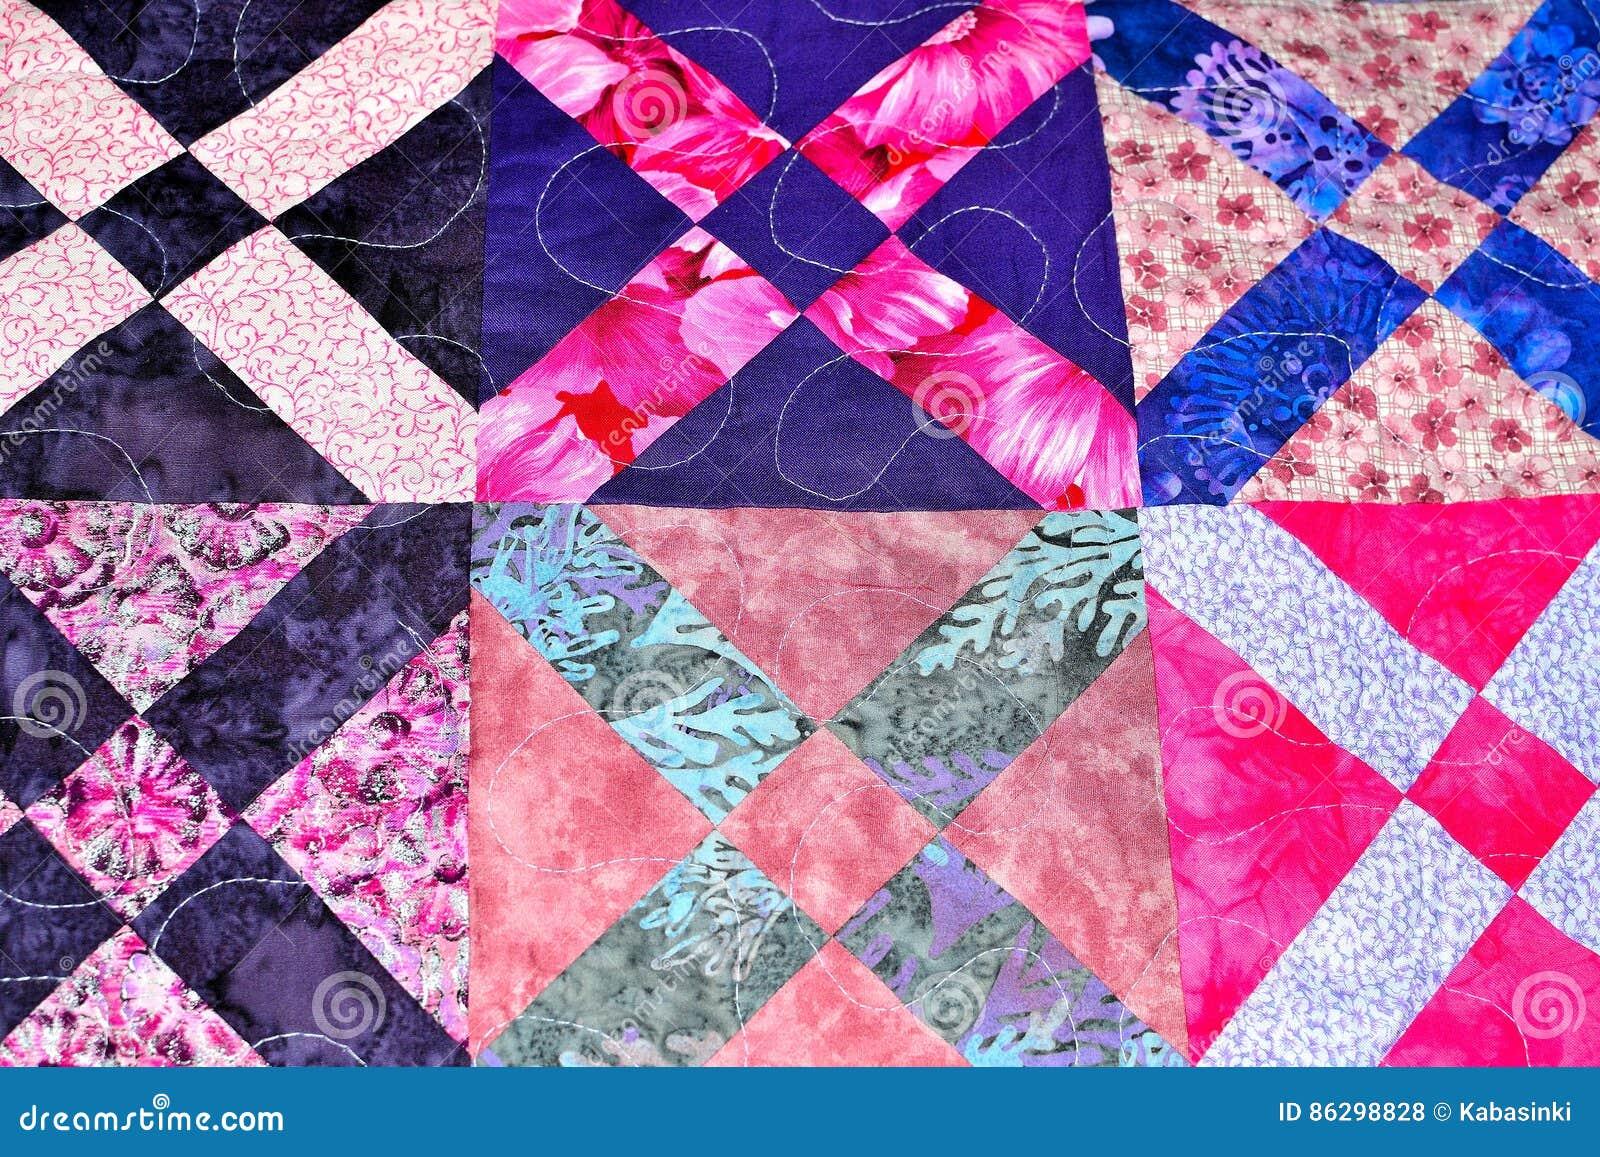 Quilt Patchwork Texture Vector Illustration